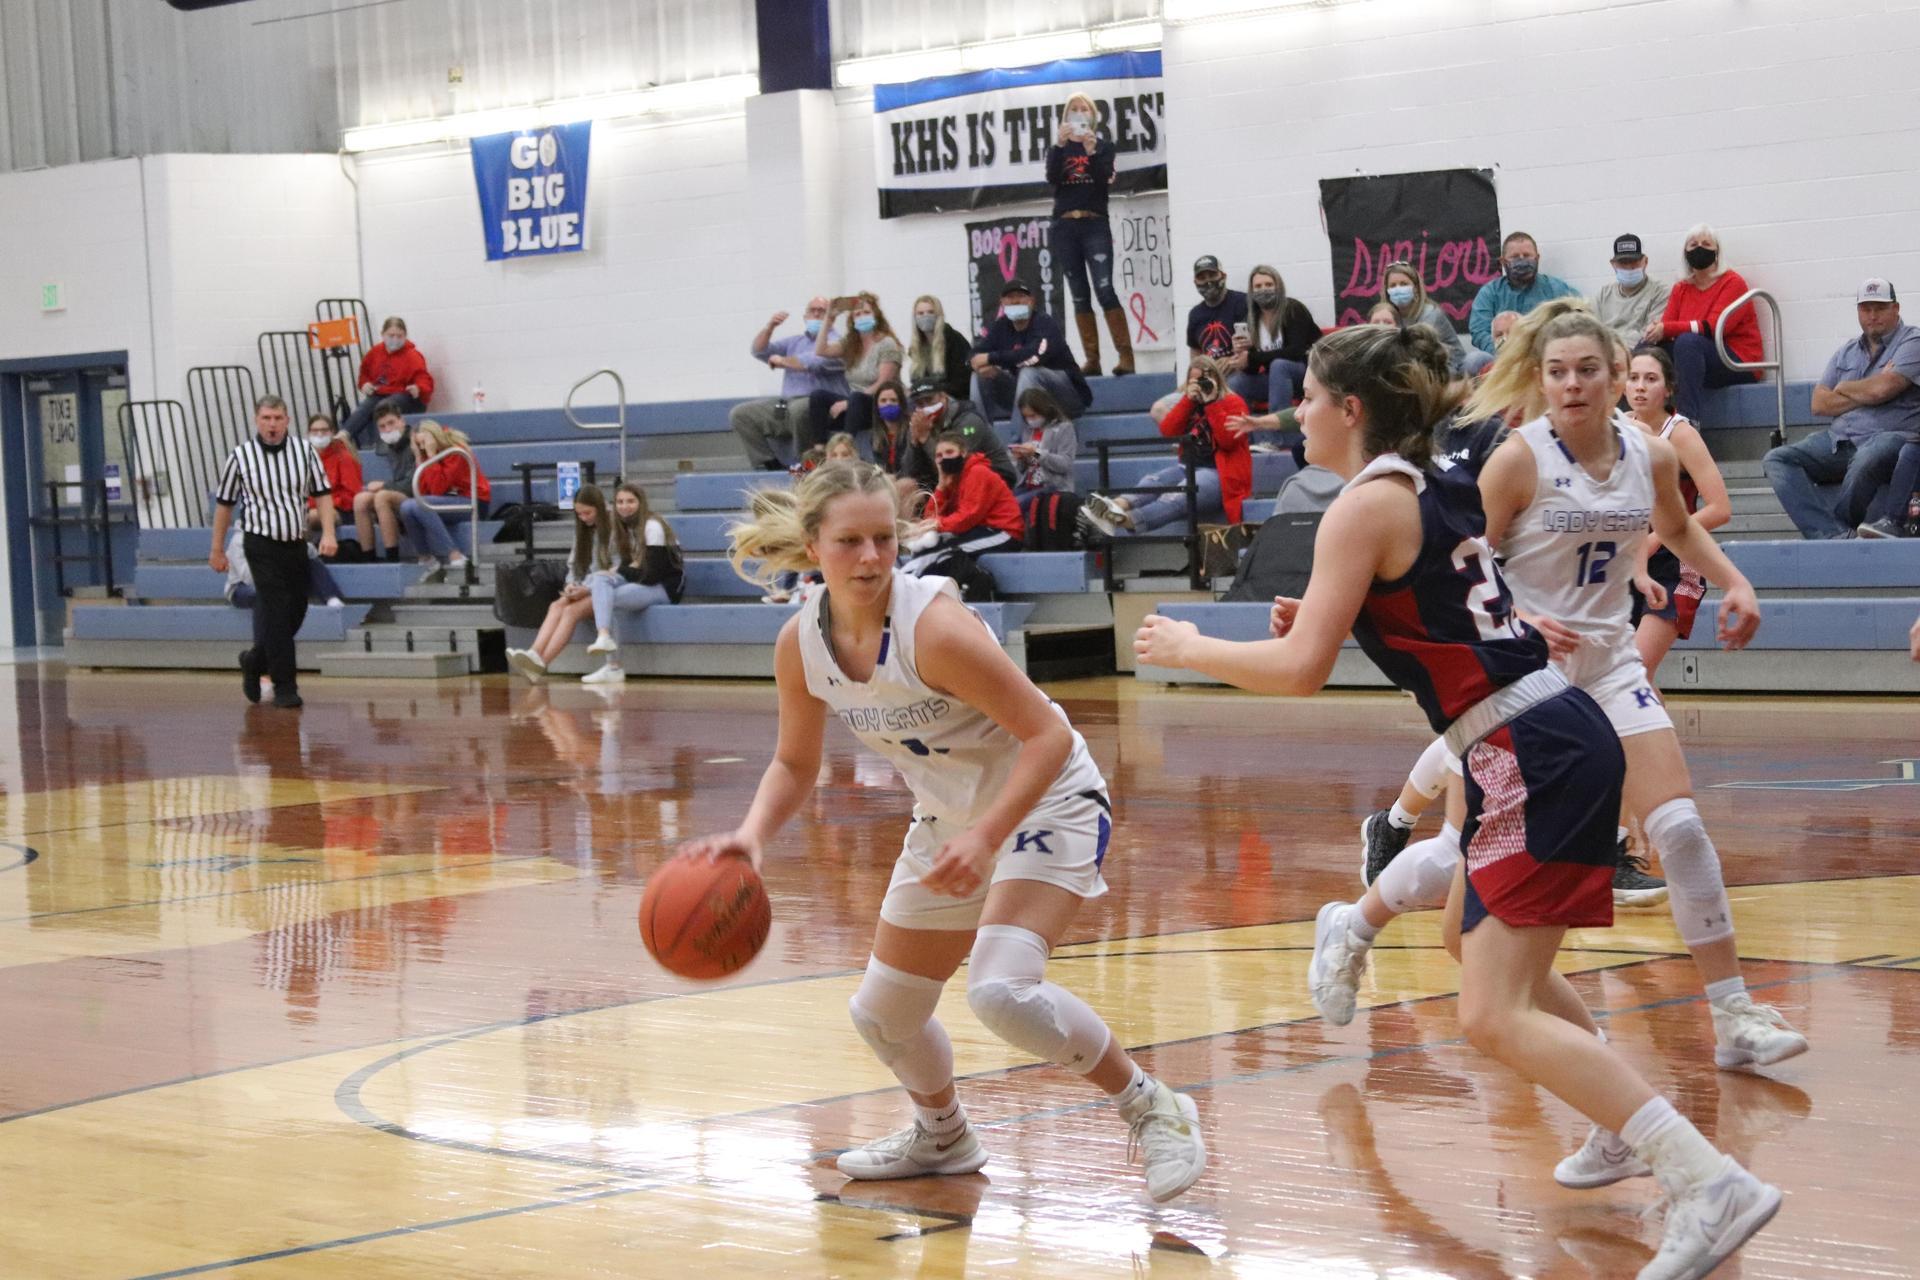 a female basketball player dodges around a guard